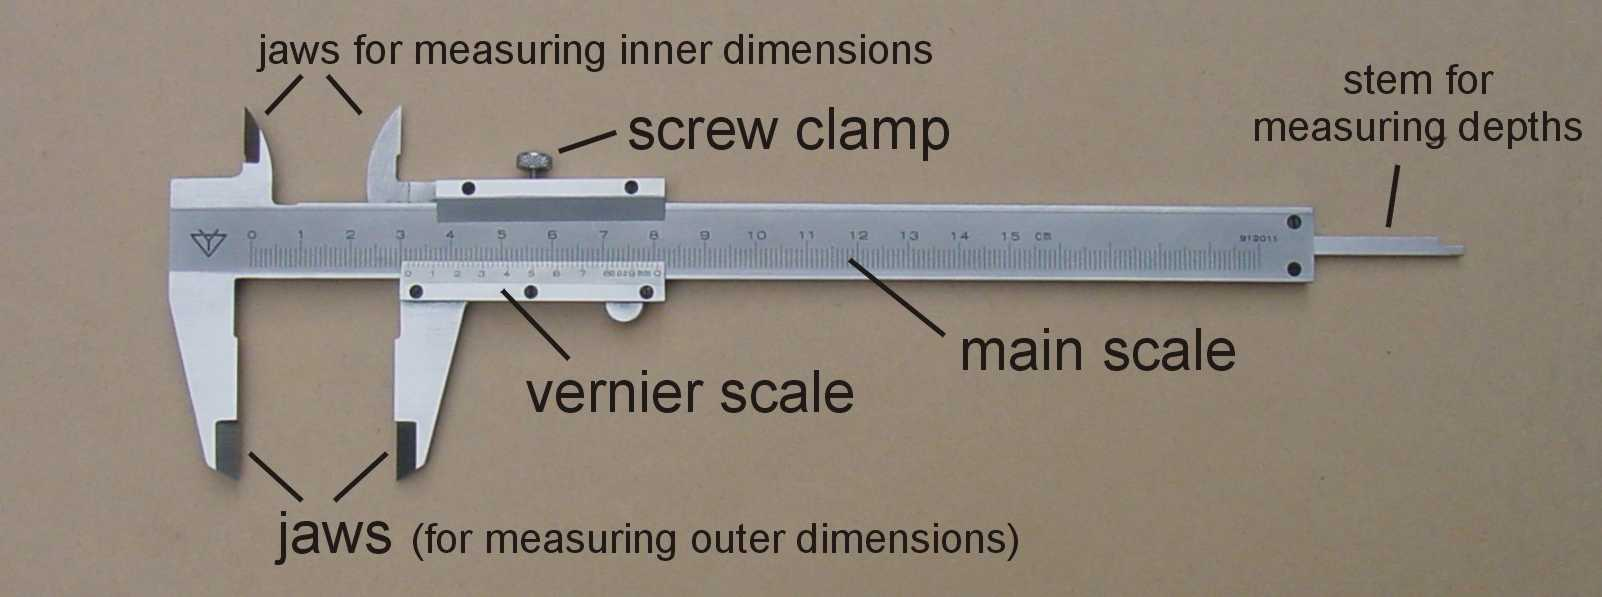 Using the Vernier Calipers & Micrometer Screw Gauge